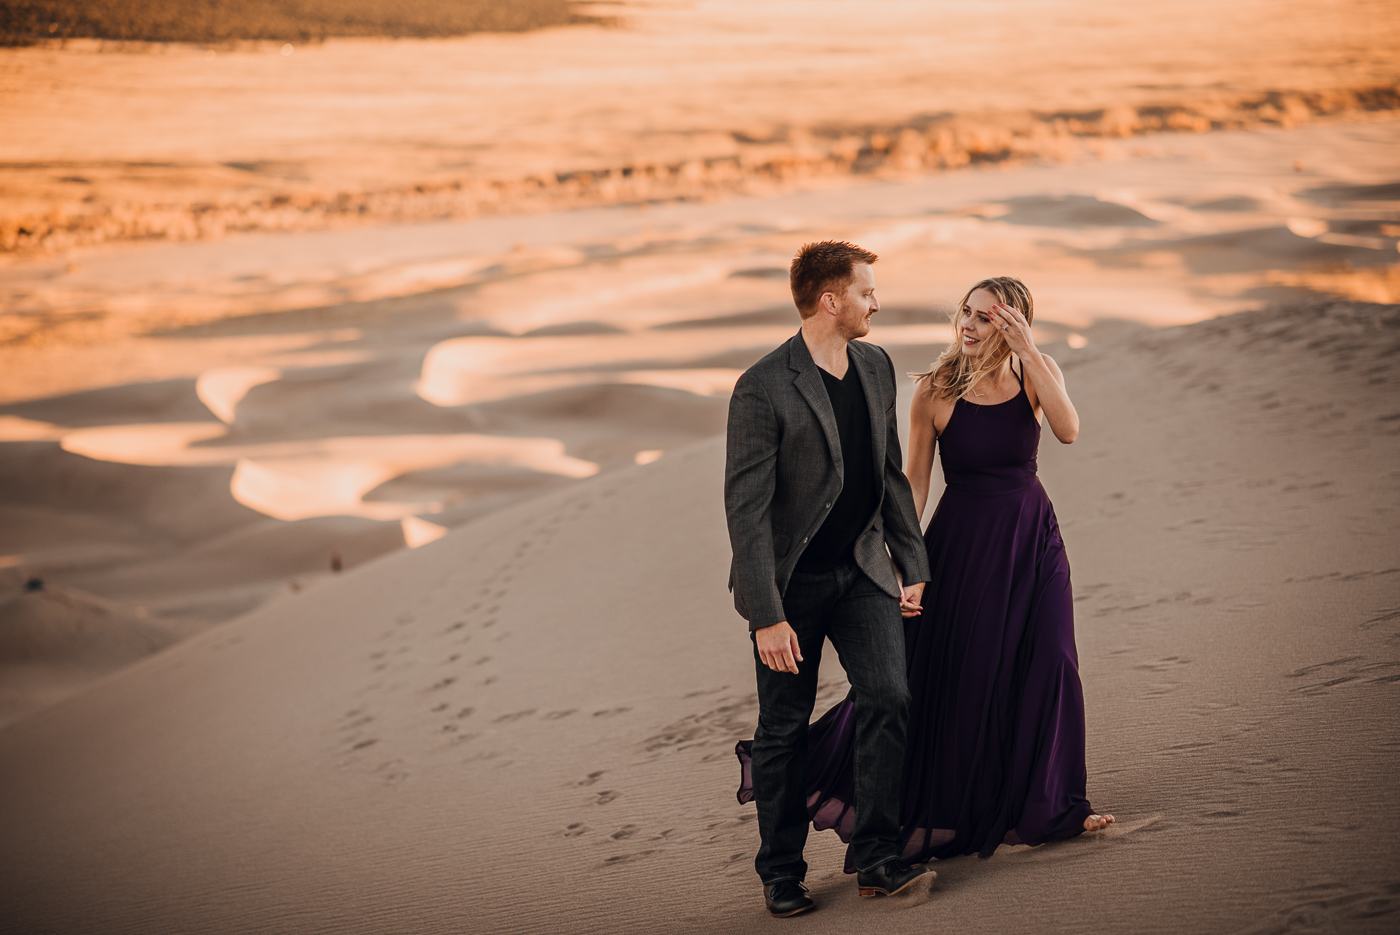 Great Sand Dunes Engagement Session PHOCO Photographer Colorado Flowy Dress Dark Moody-4.jpg